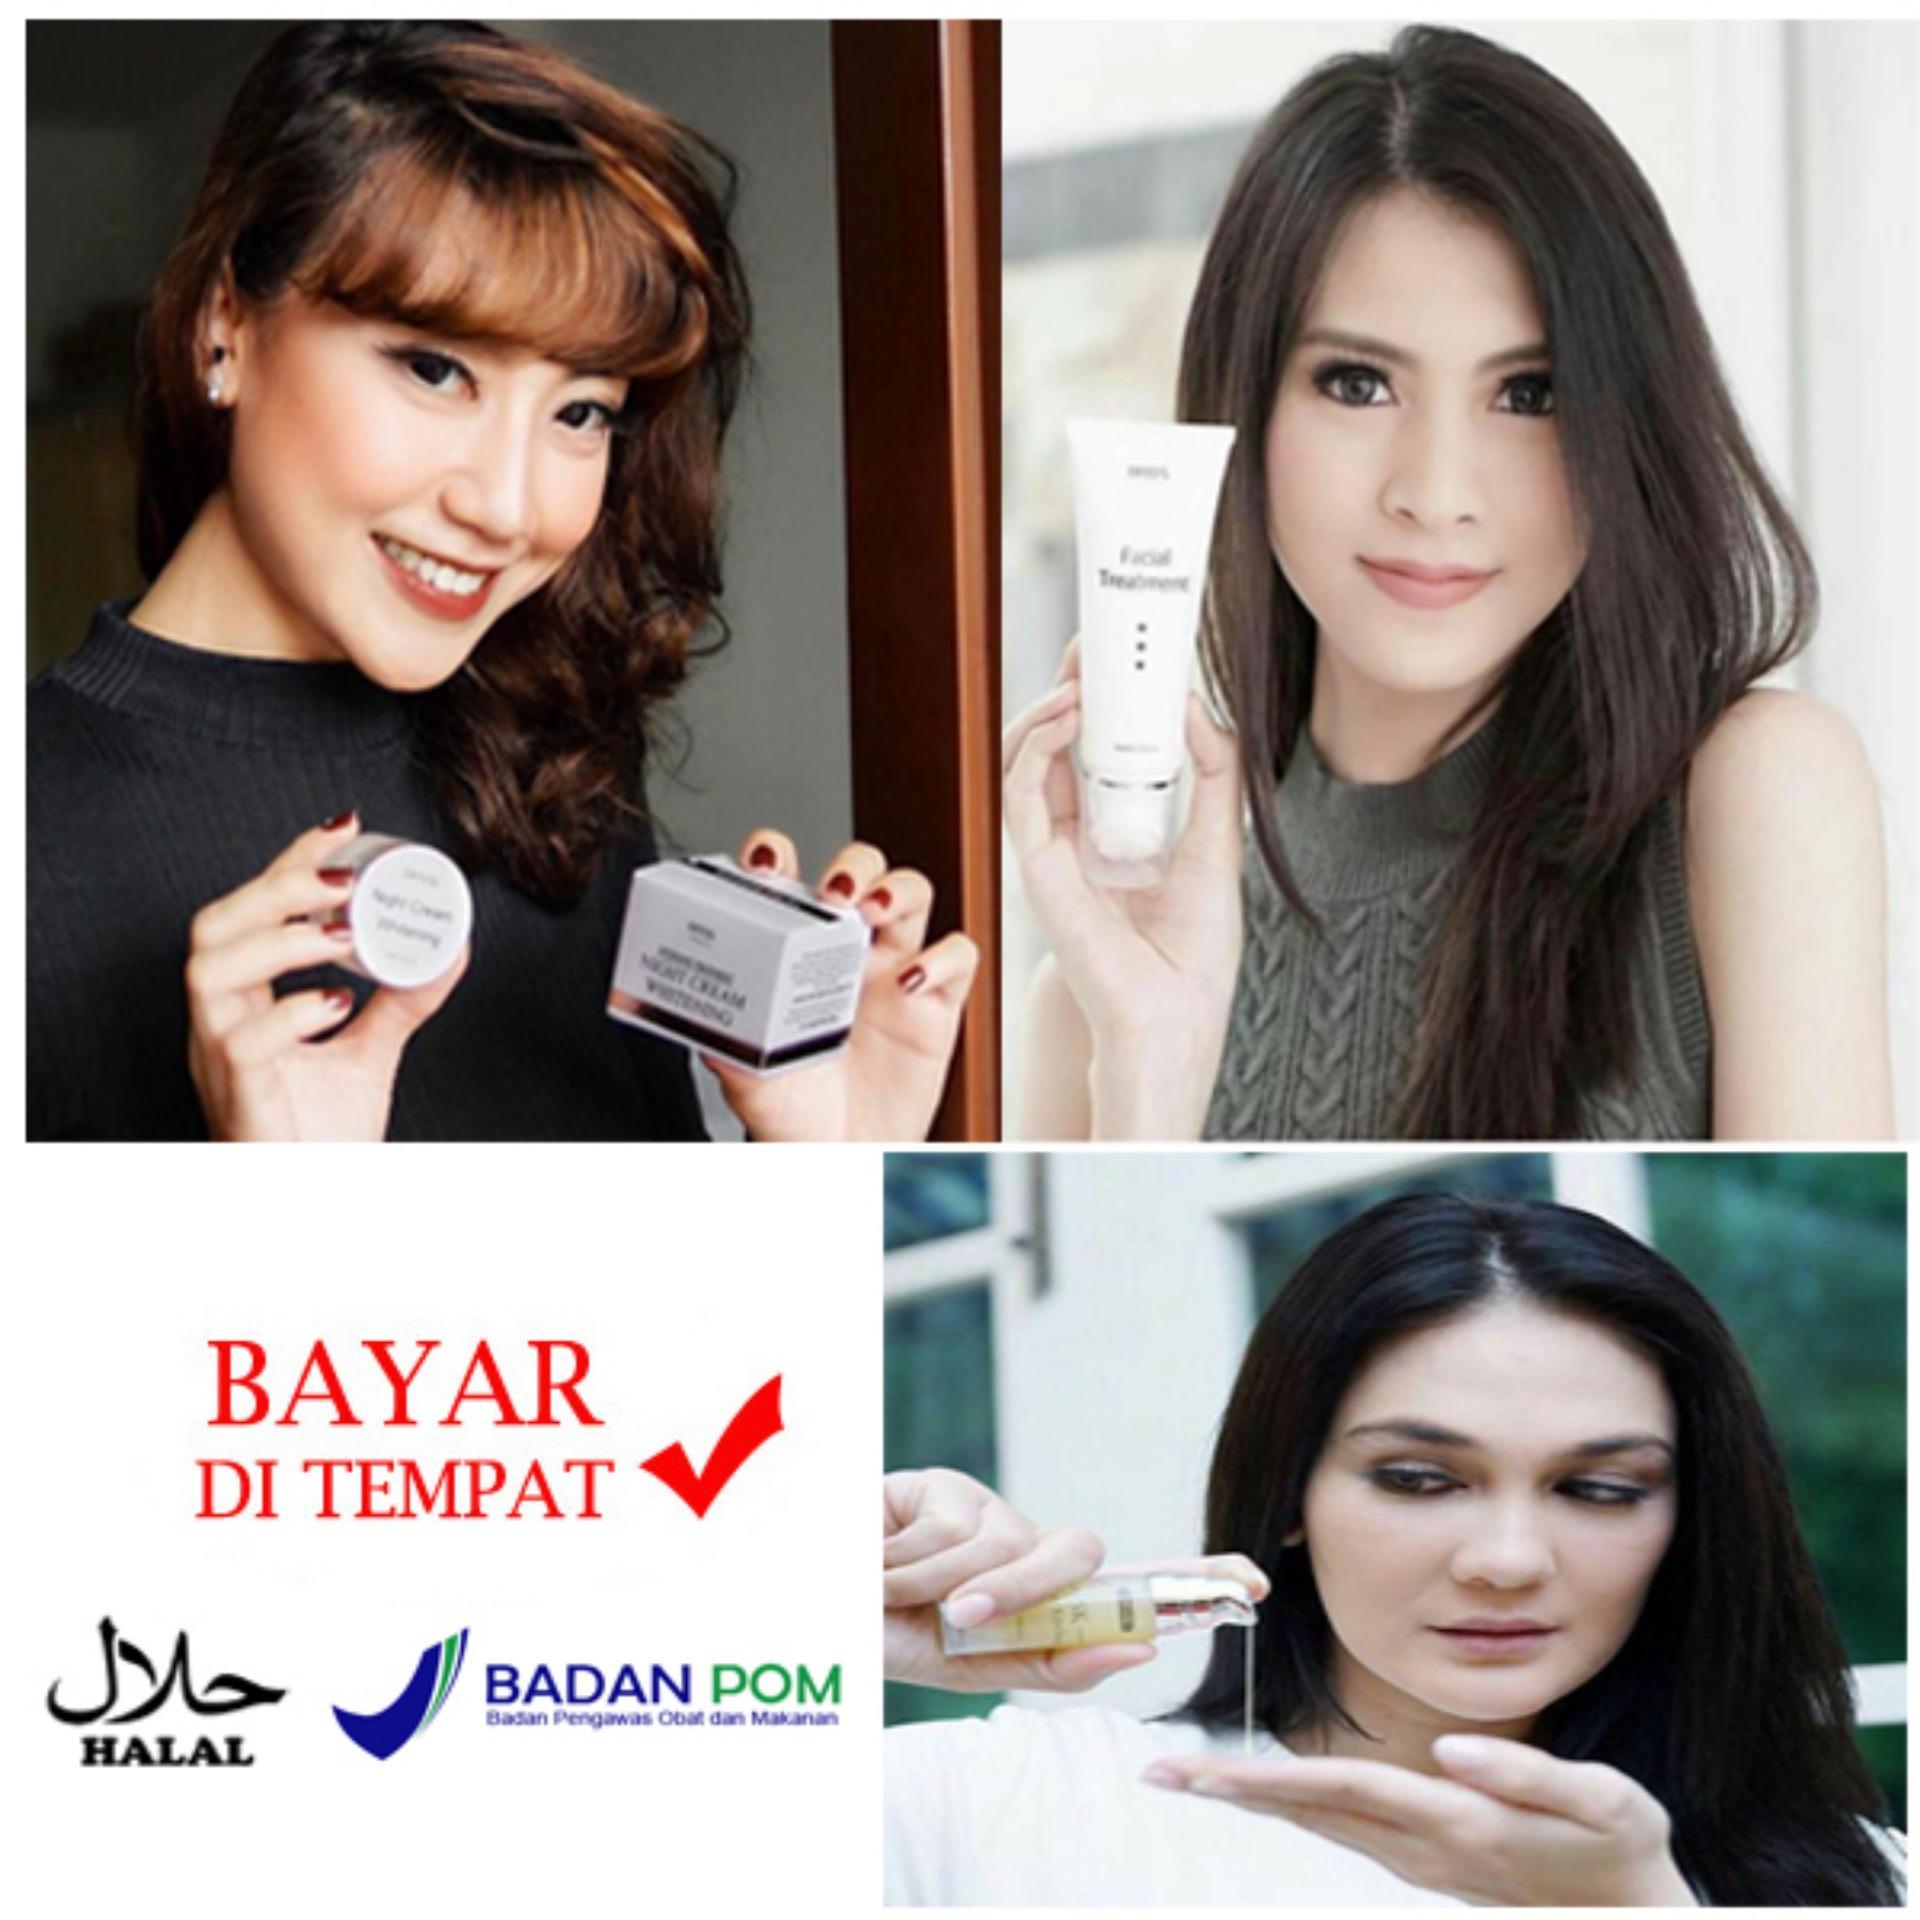 Kelebihan Ertos Paket Glowing Super Murah Facial Treatment Serum Kinclong Original Detail Gambar Night Care Cream Terbaru